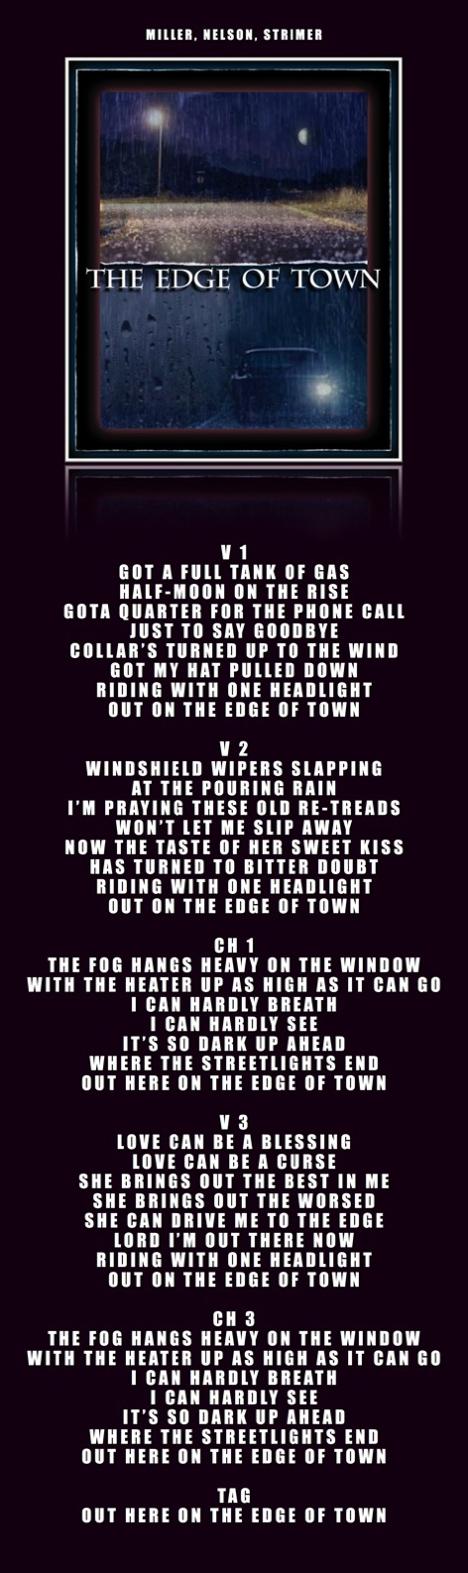 Lyric lyrics drift away : Miller's Tale songs' lyrics to read while you listen to the songs ...